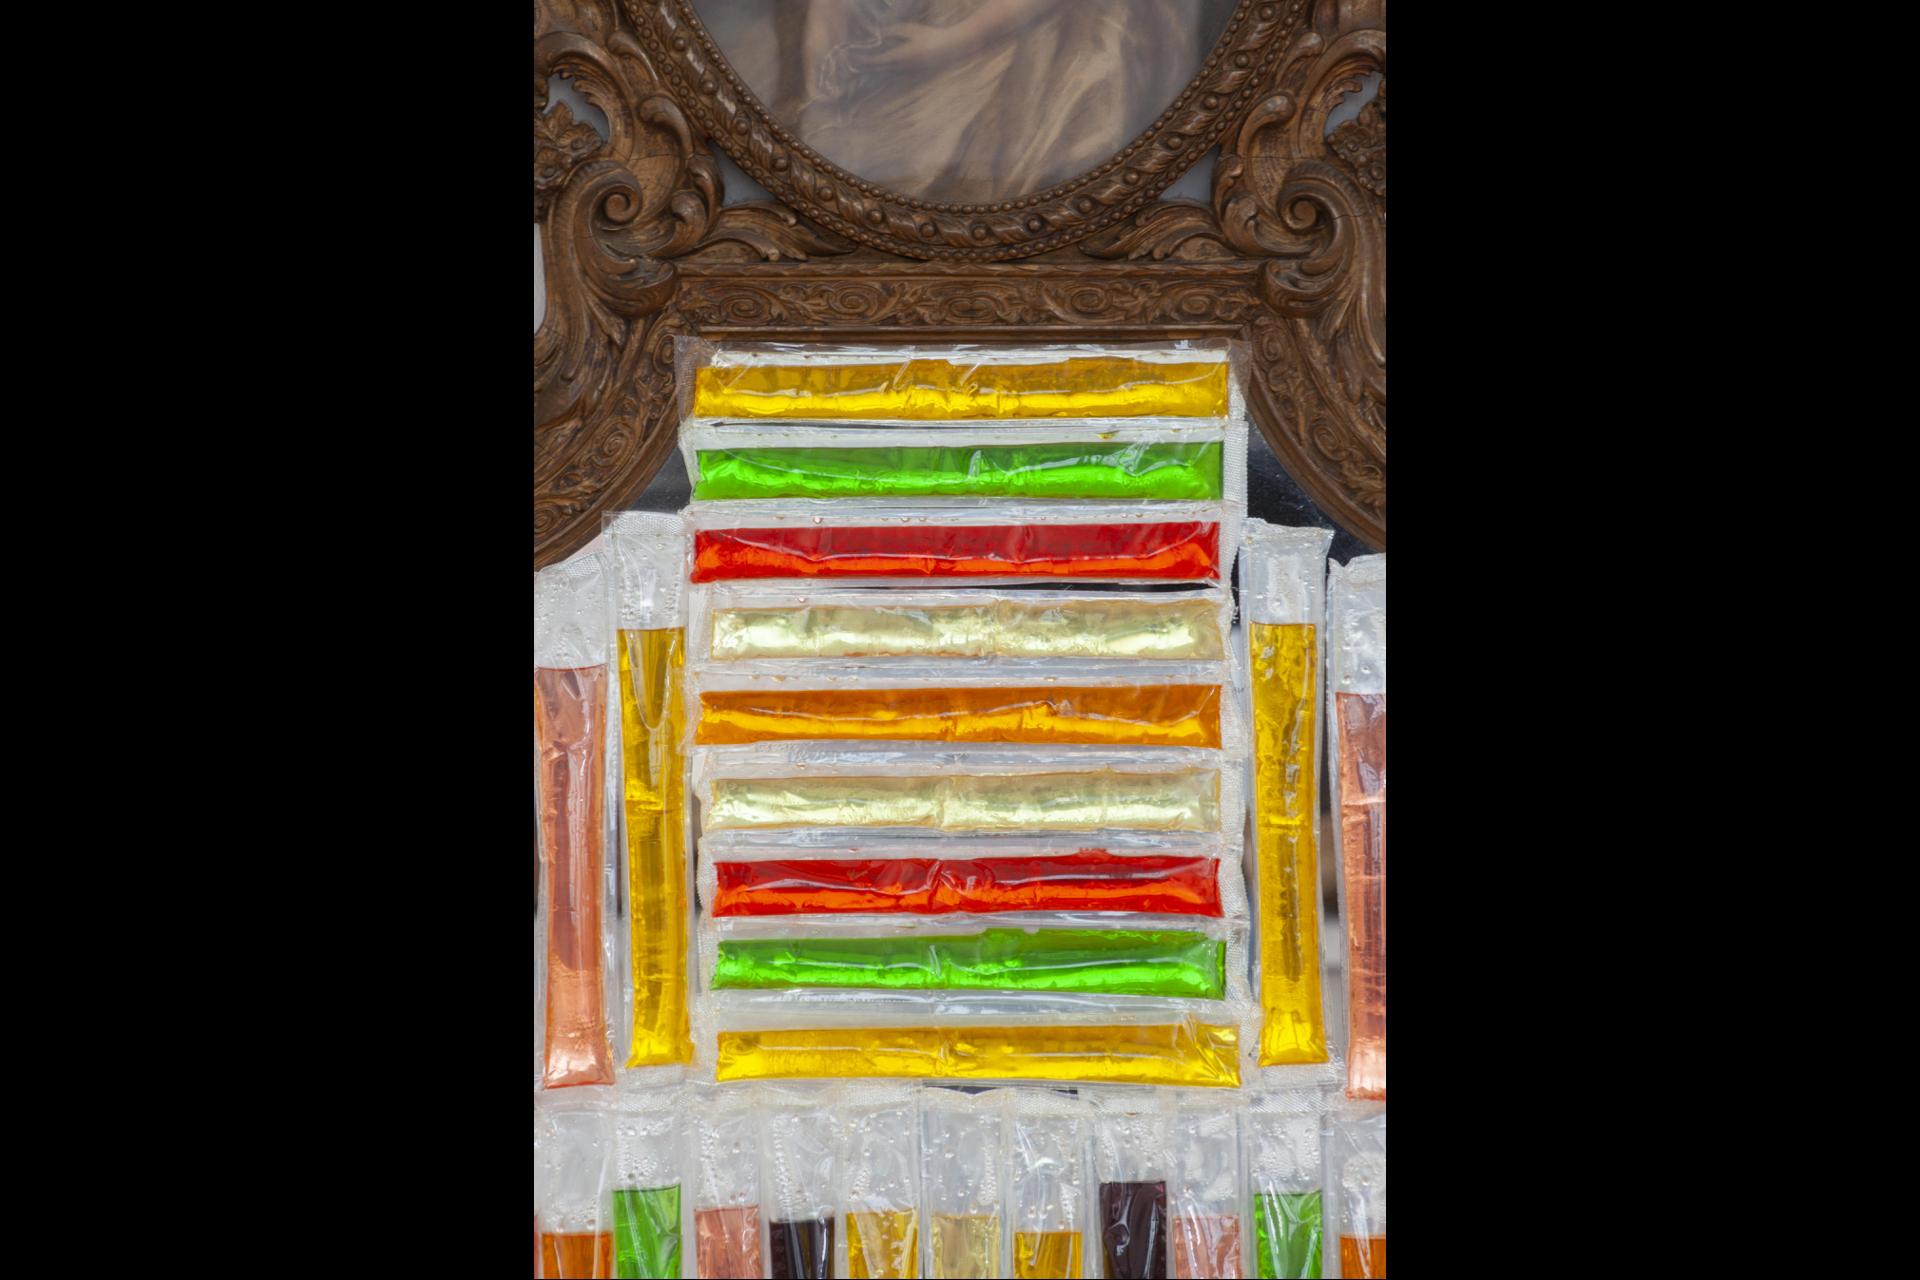 Daniel T. Gaitor-Lomack Alyssa Davis Gallery